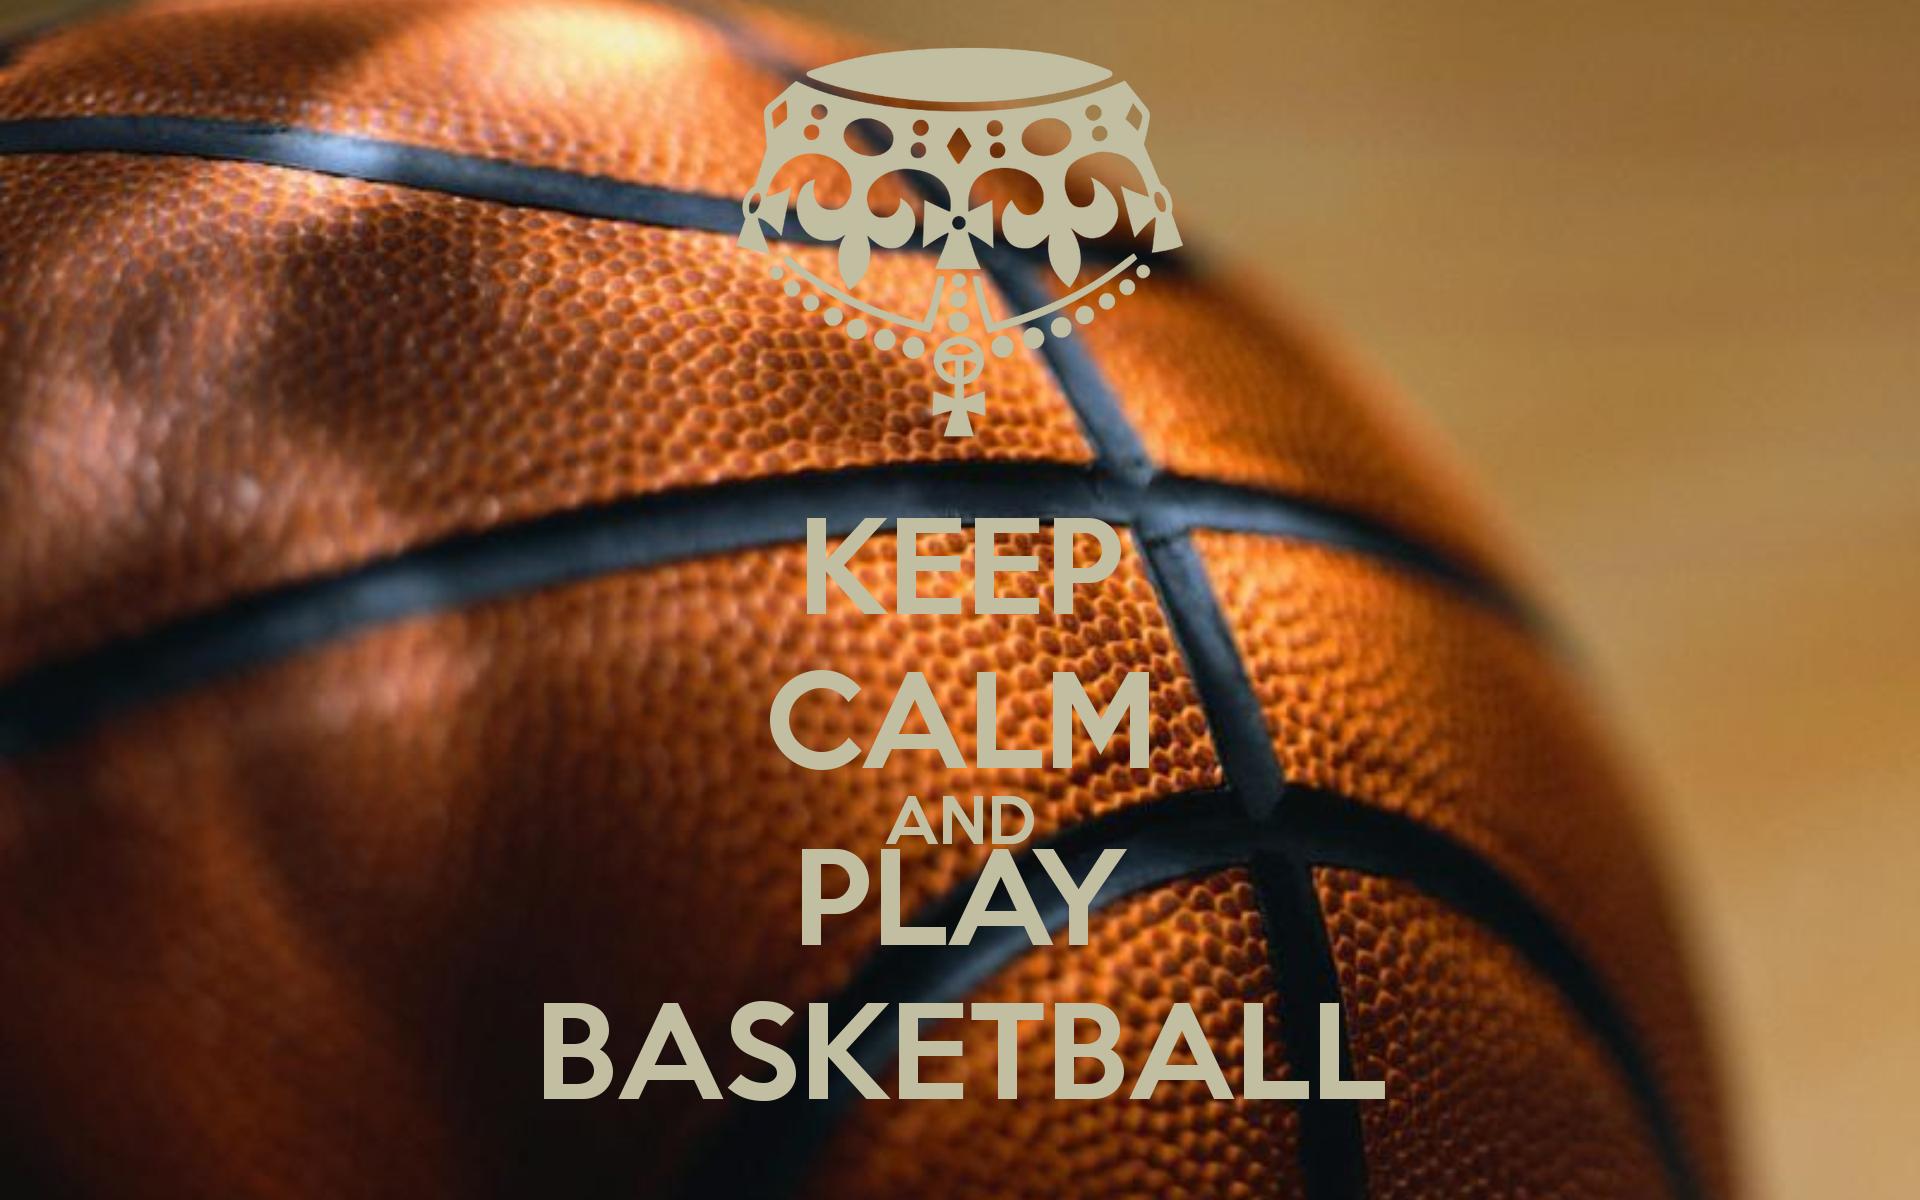 Ball Is Life Wallpaper Wallpapersafari Motivational Basketball Quotes Basketball Basketball Quotes